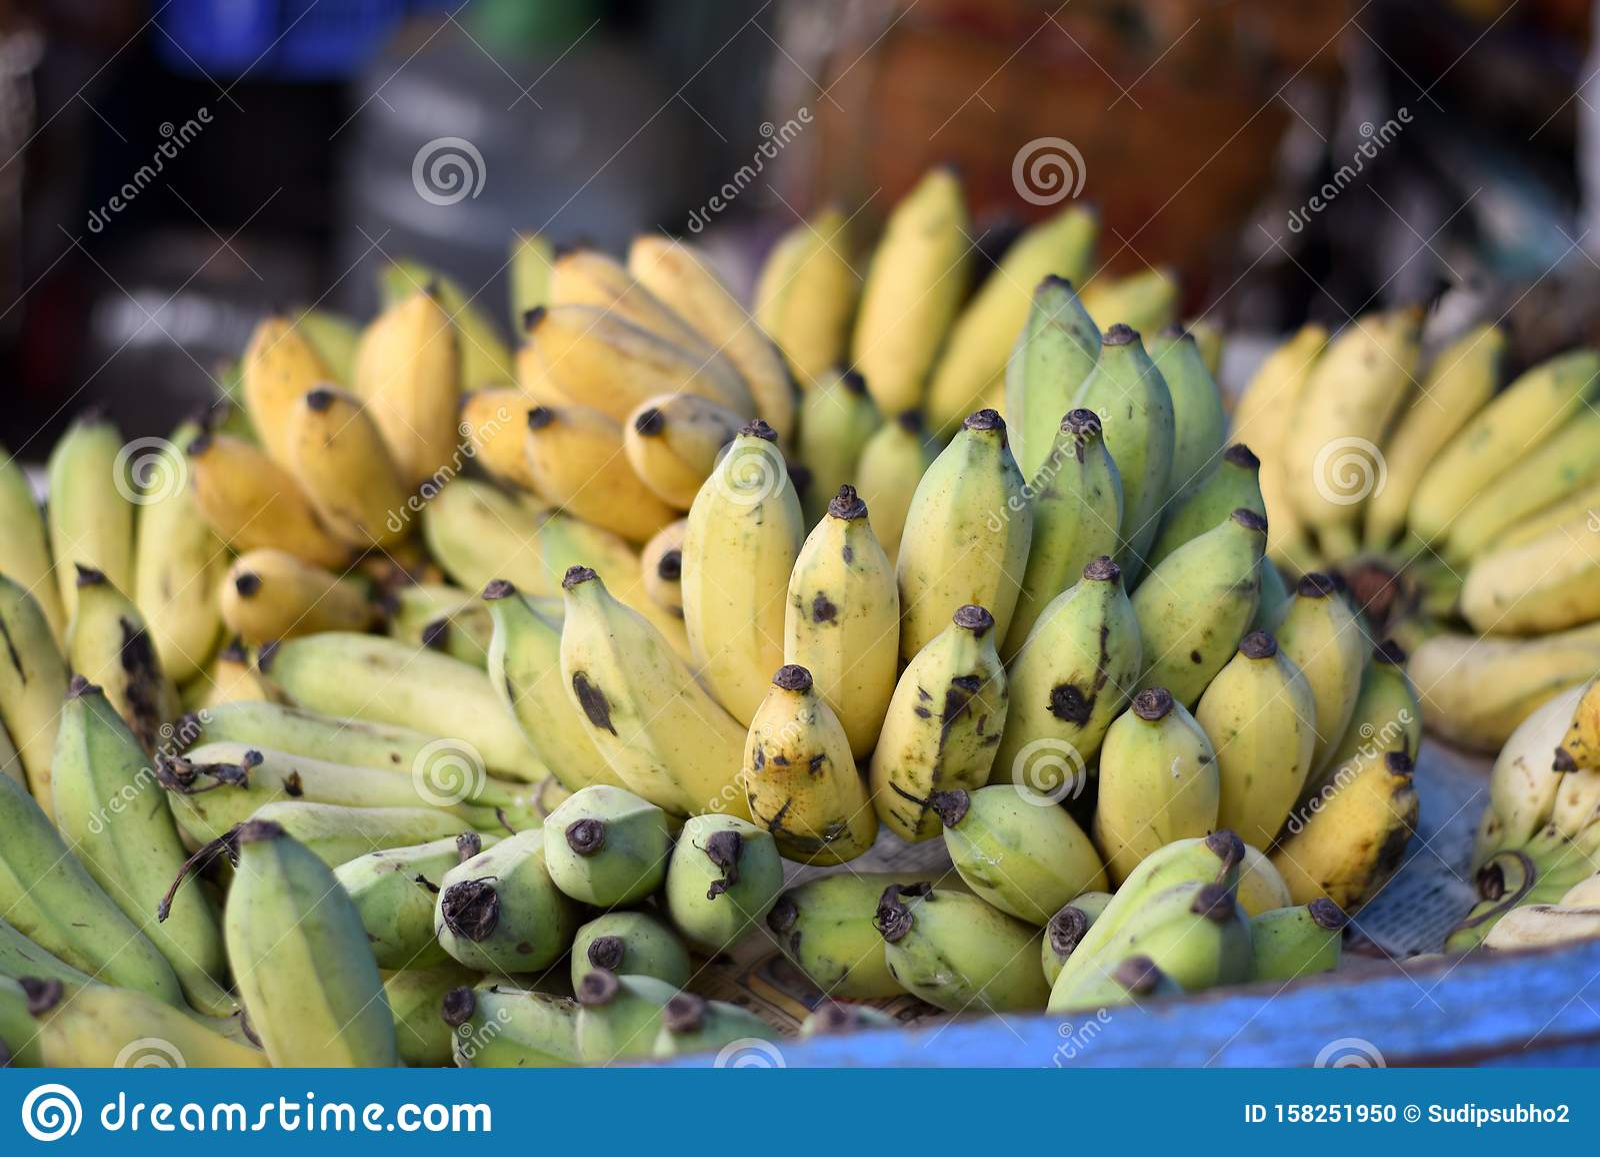 Banana Fruit on sale in the market Patuli Floating Market, Kolkata, India